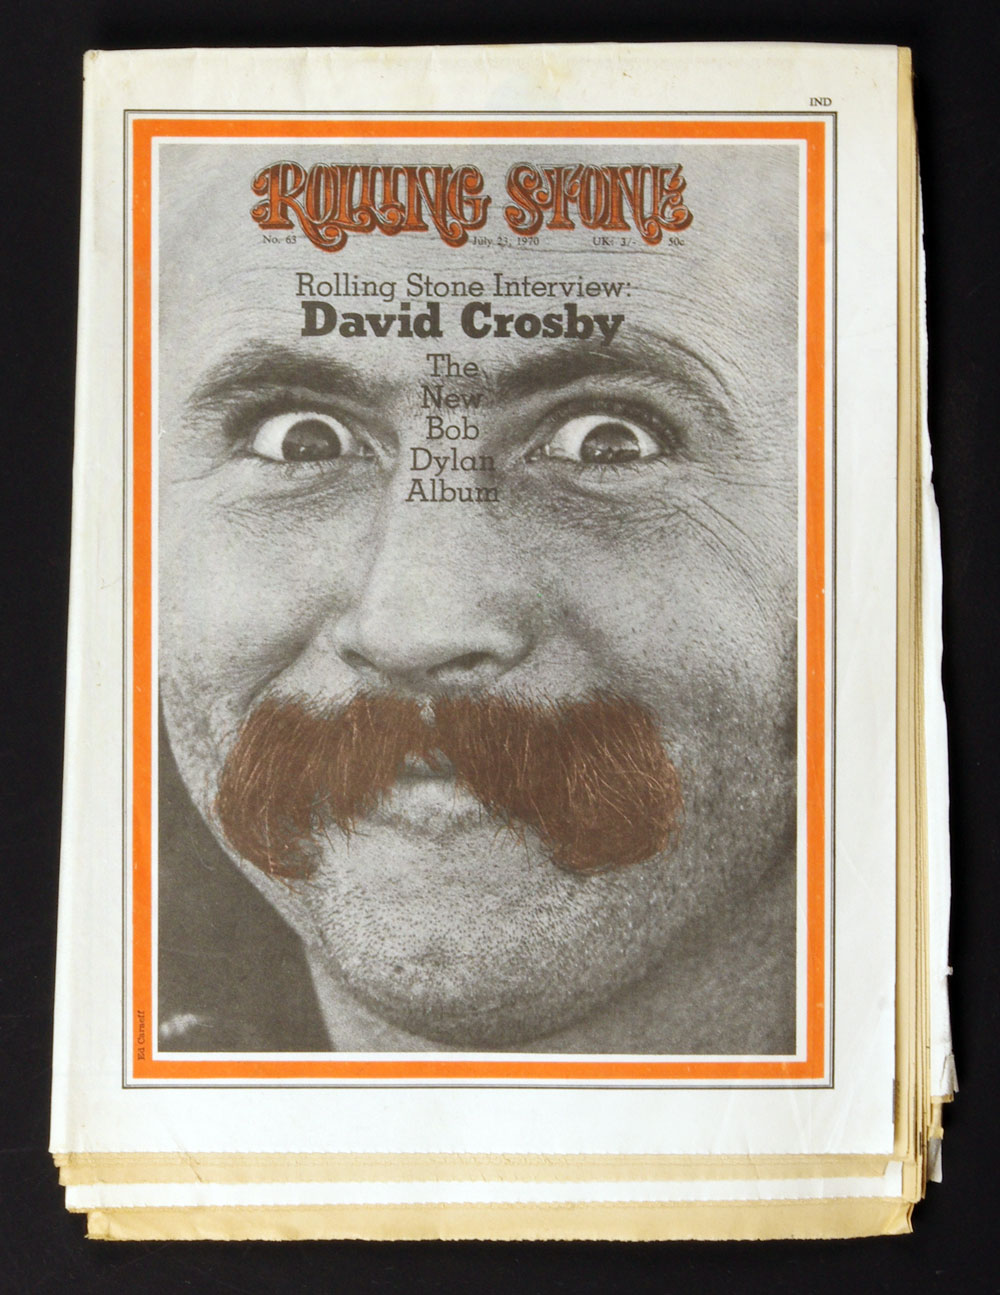 Rolling Stone Magazine 1970 Jul 23 No. 63 David Crosby